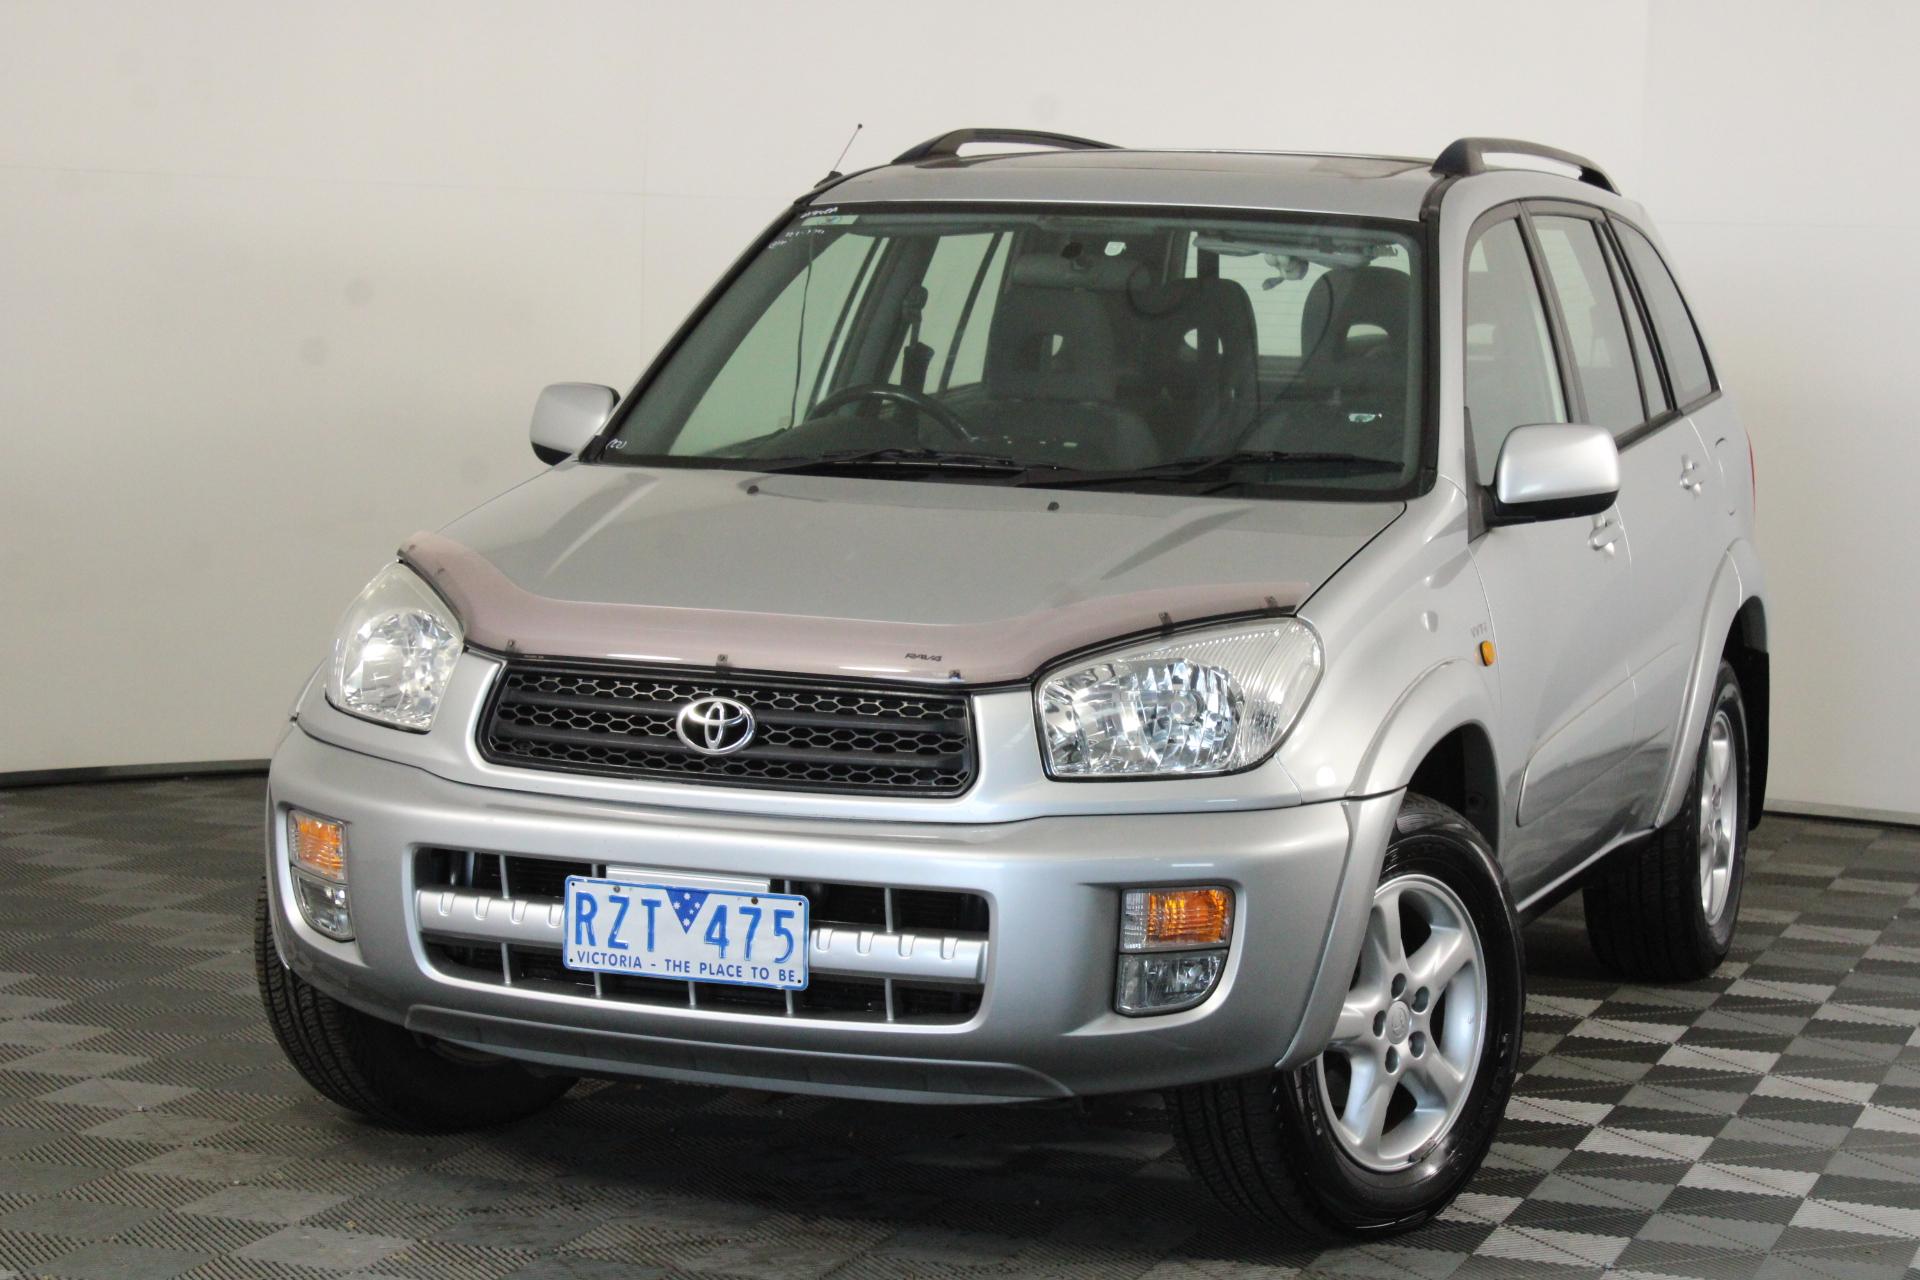 2002 Toyota Rav 4 Cruiser (4x4) Automatic Wagon